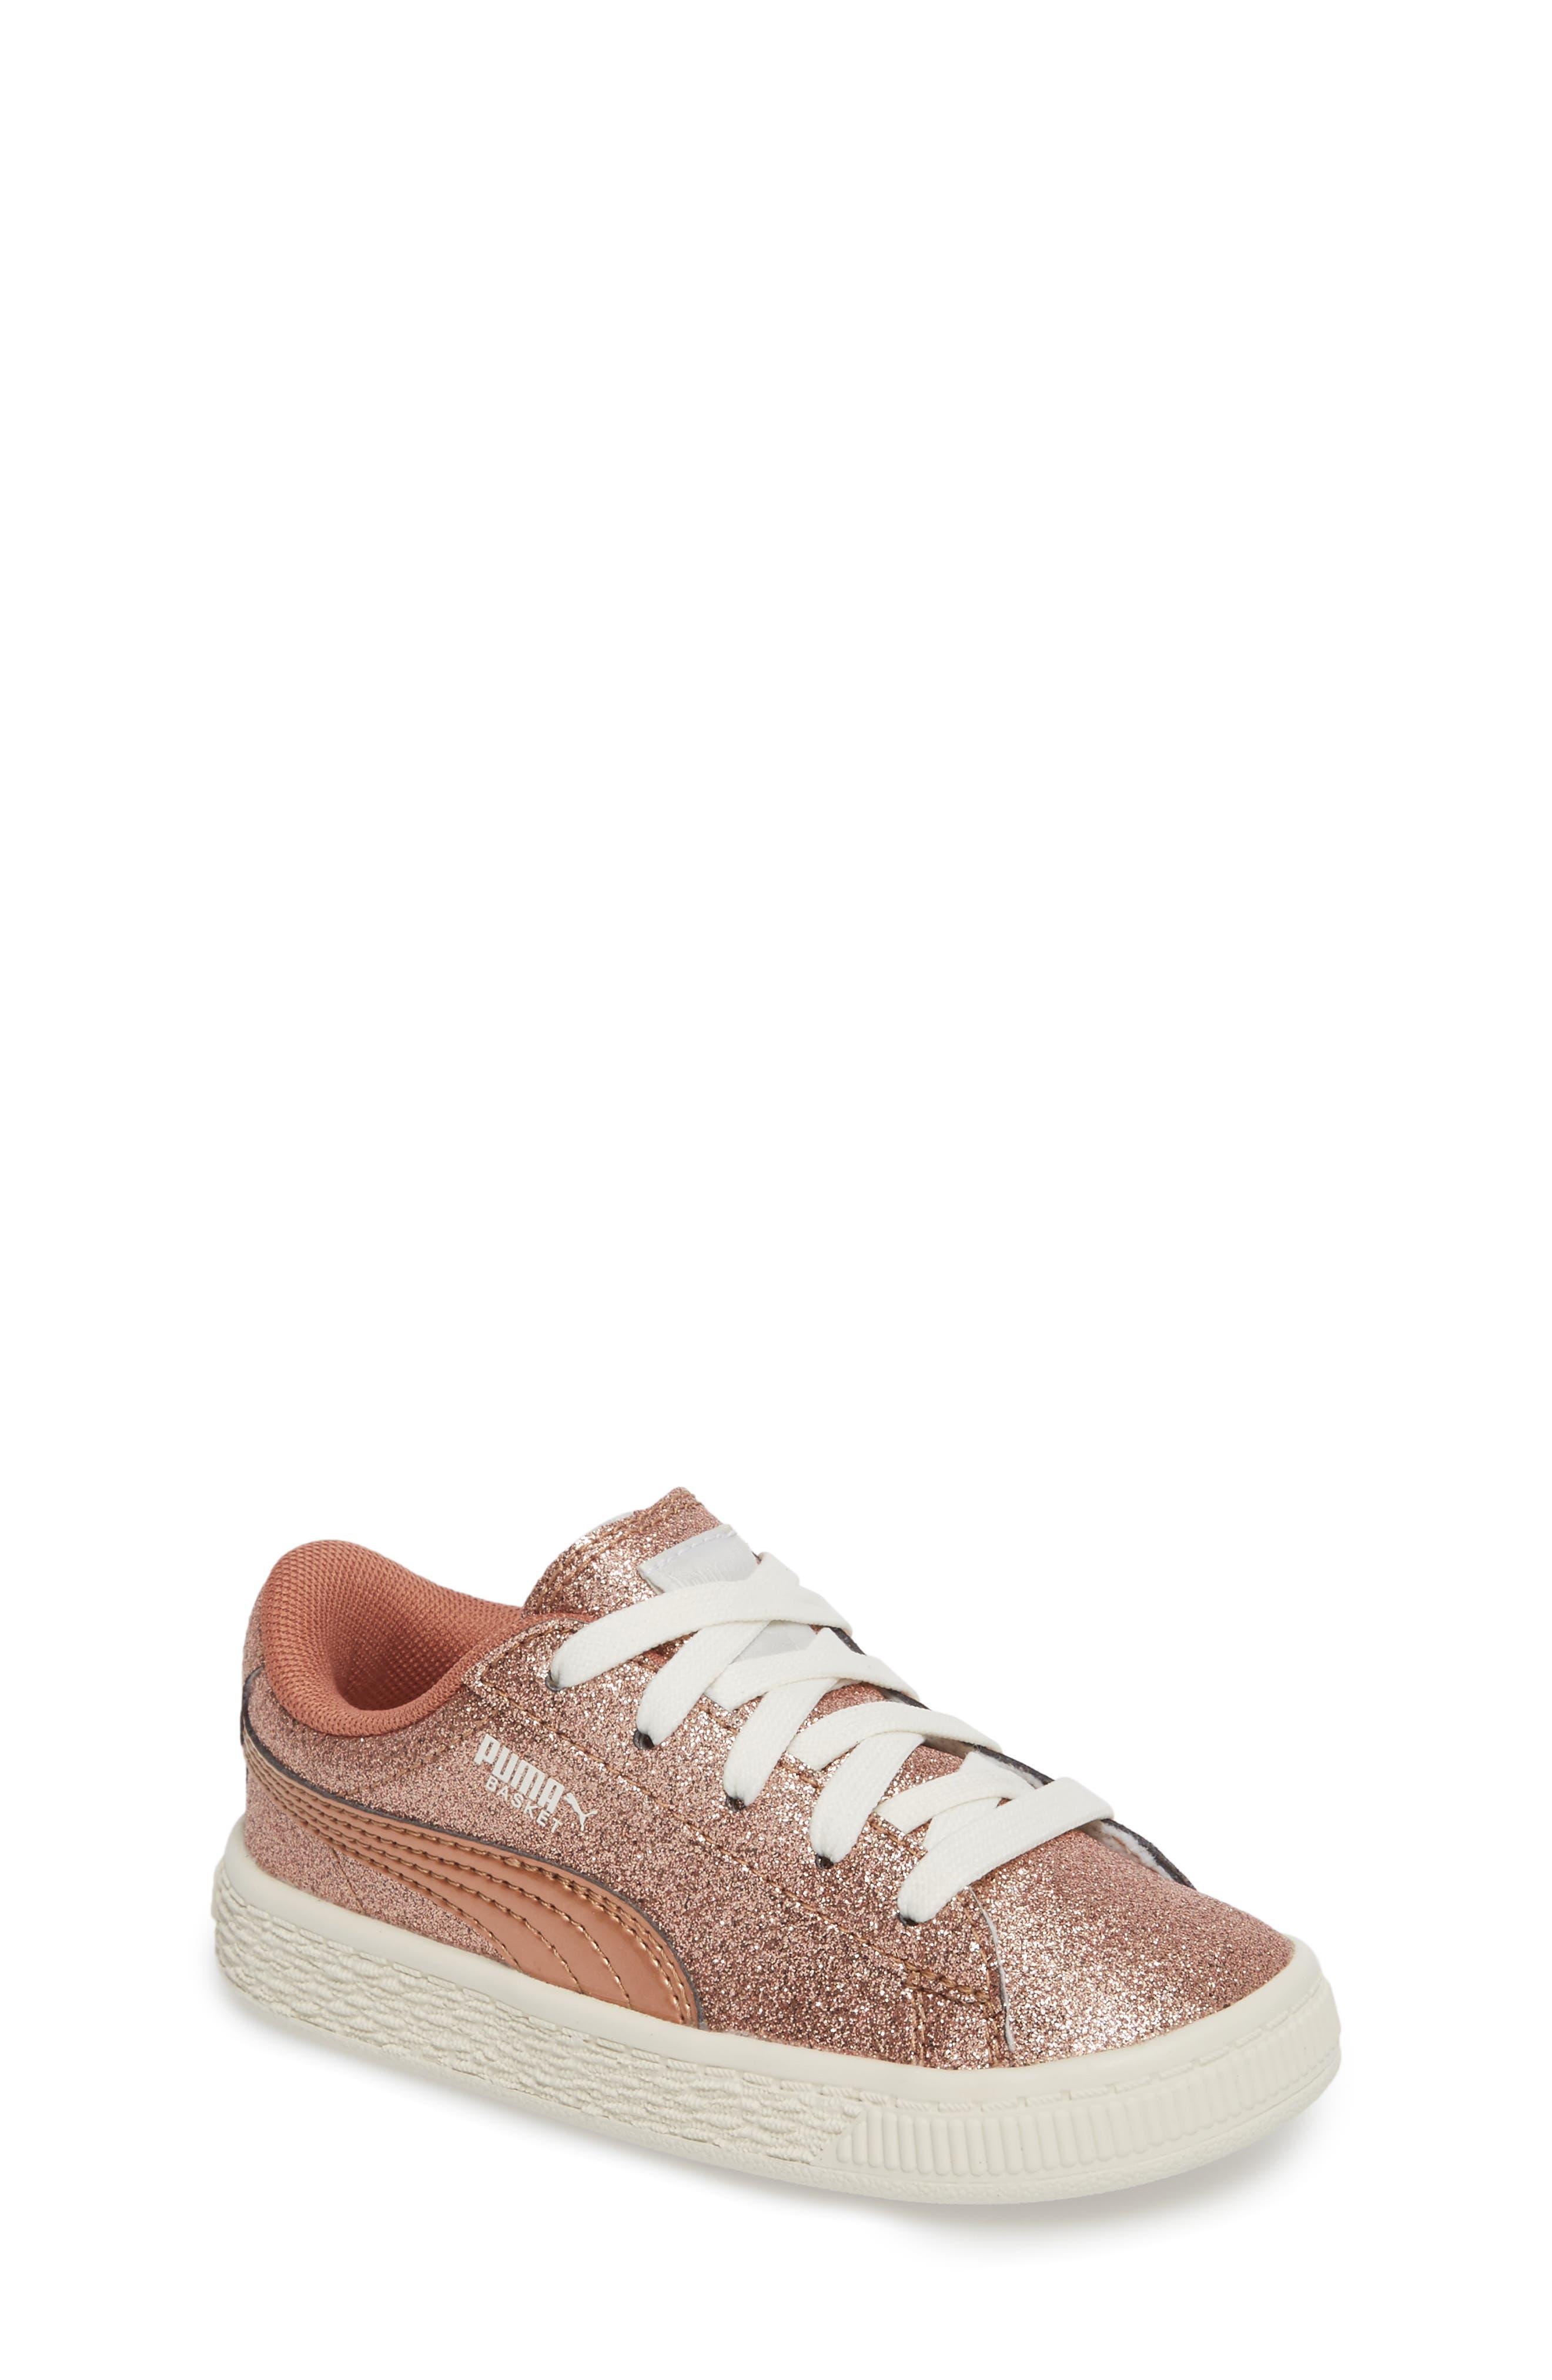 Basket Holiday Glitz Jr. Sneaker,                         Main,                         color, Copper Rose